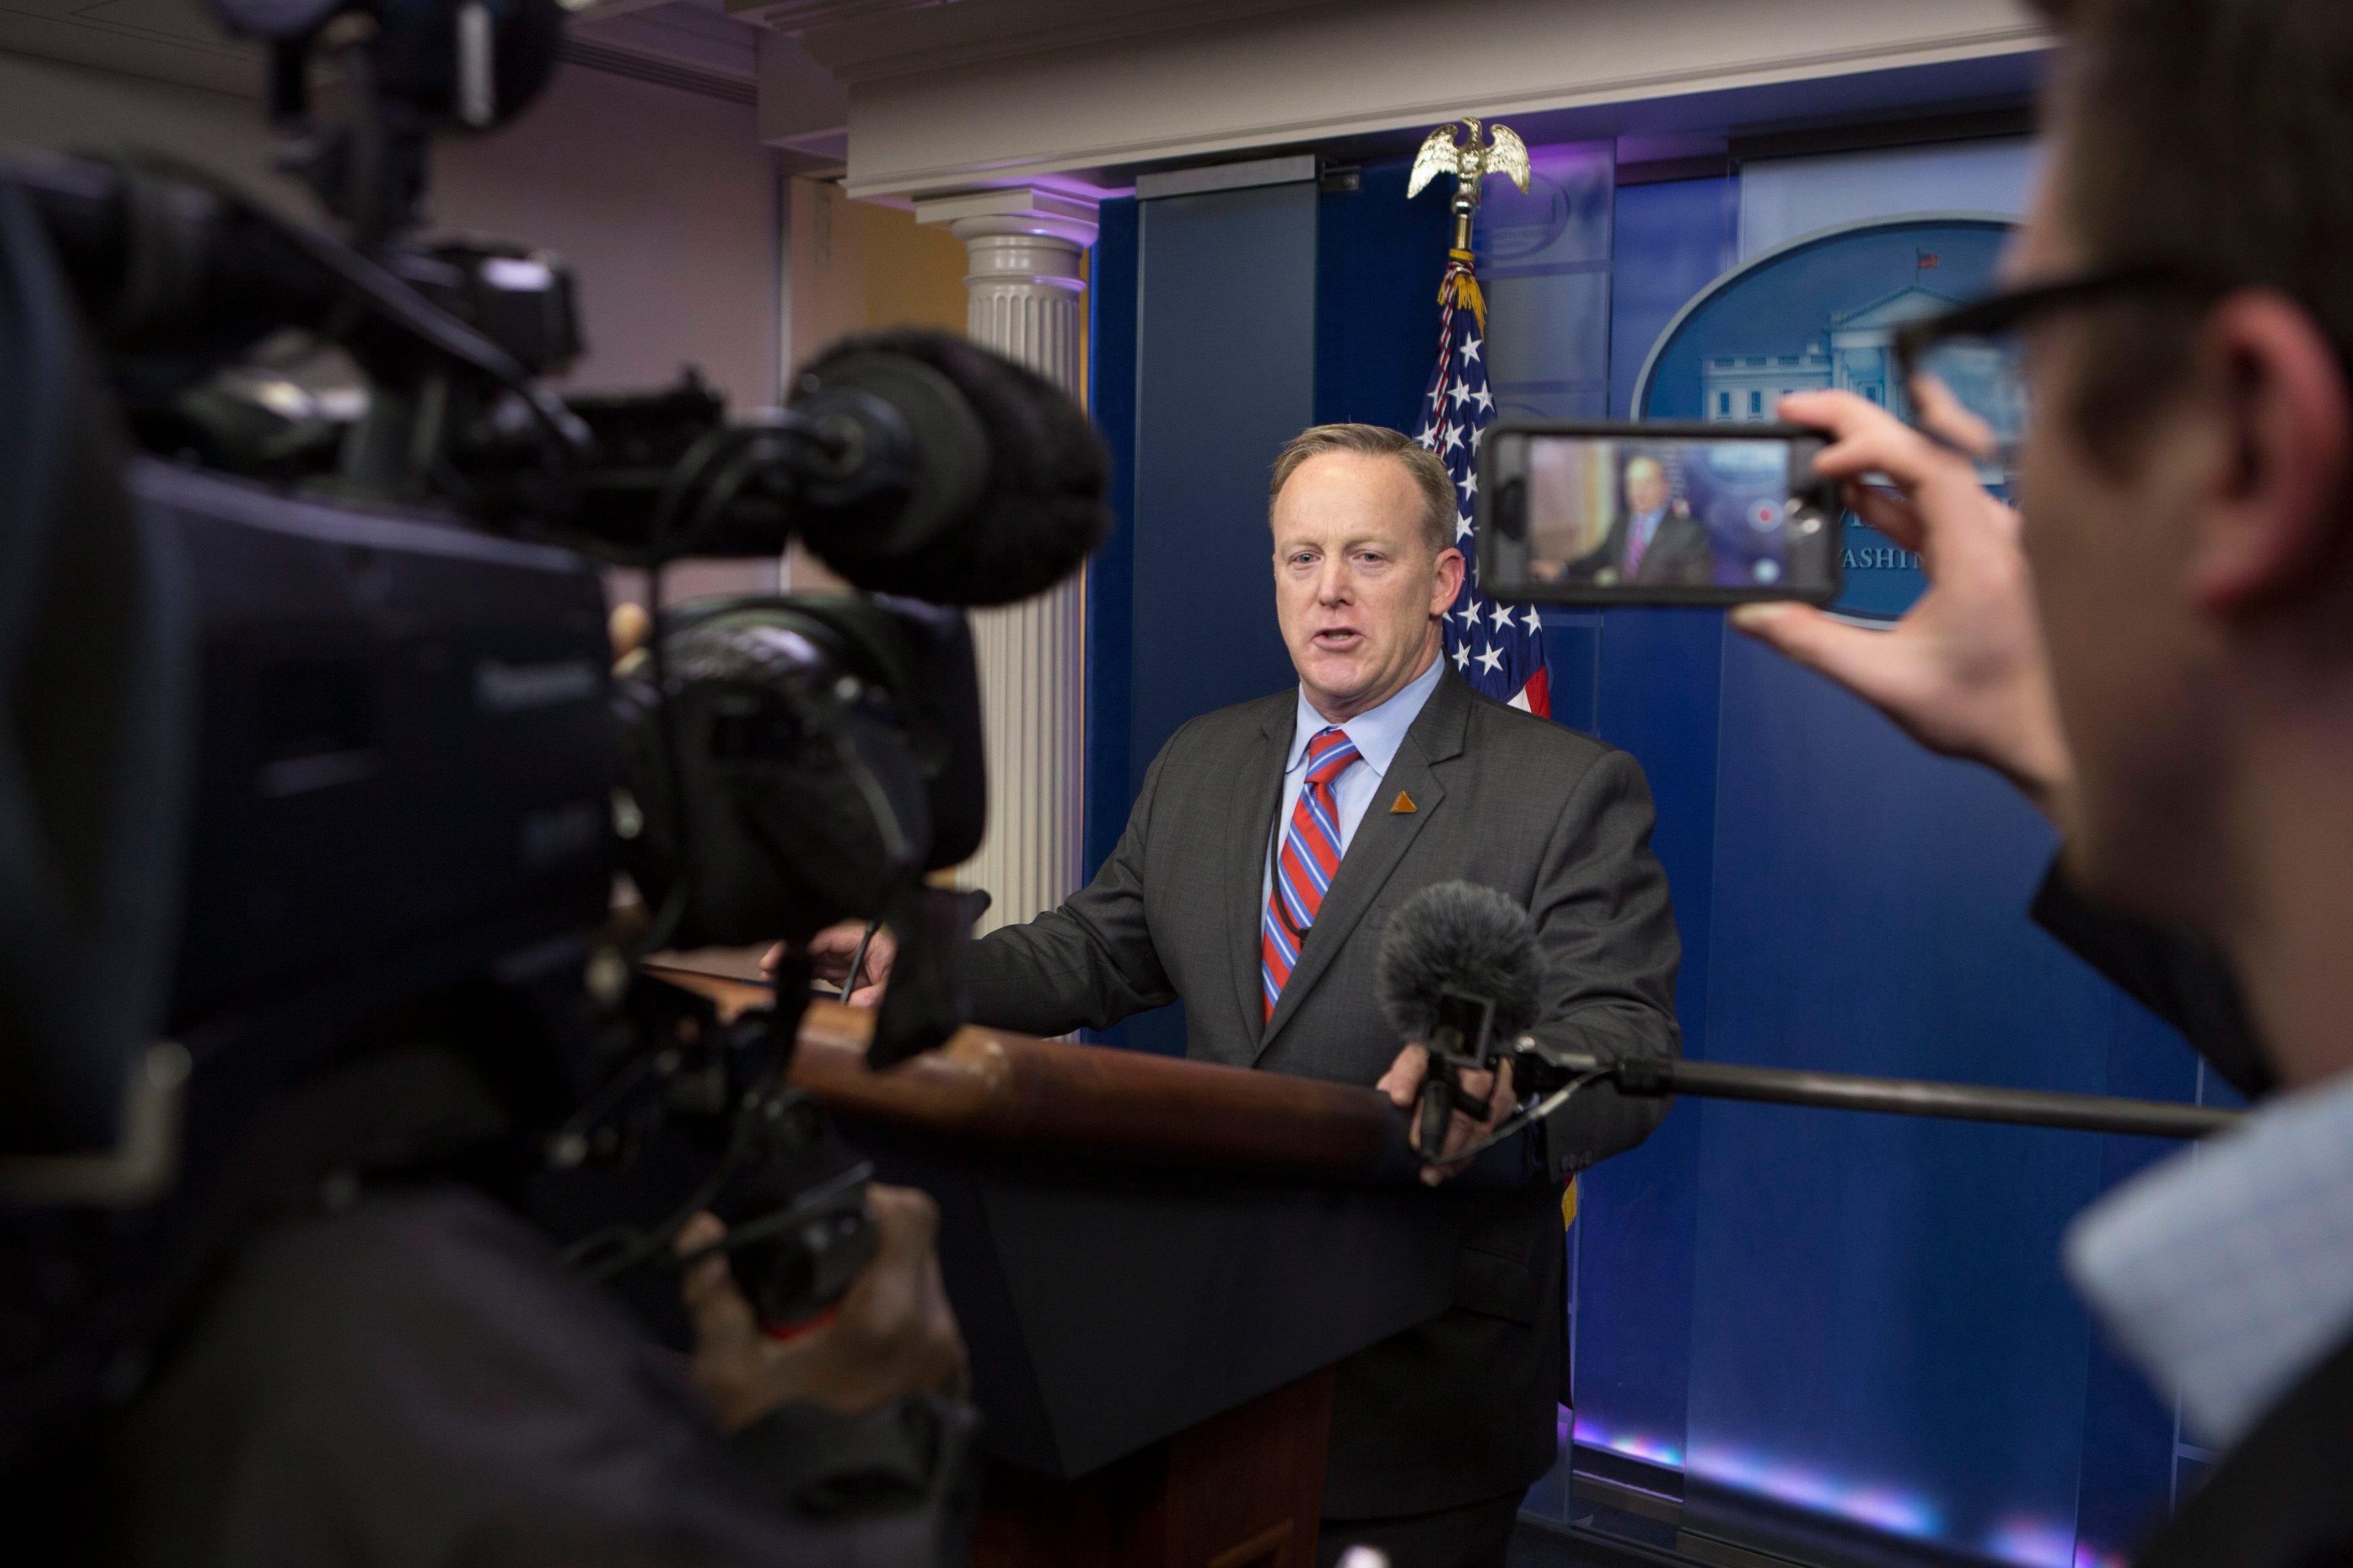 On second day, White House press secretary strikes combative tone